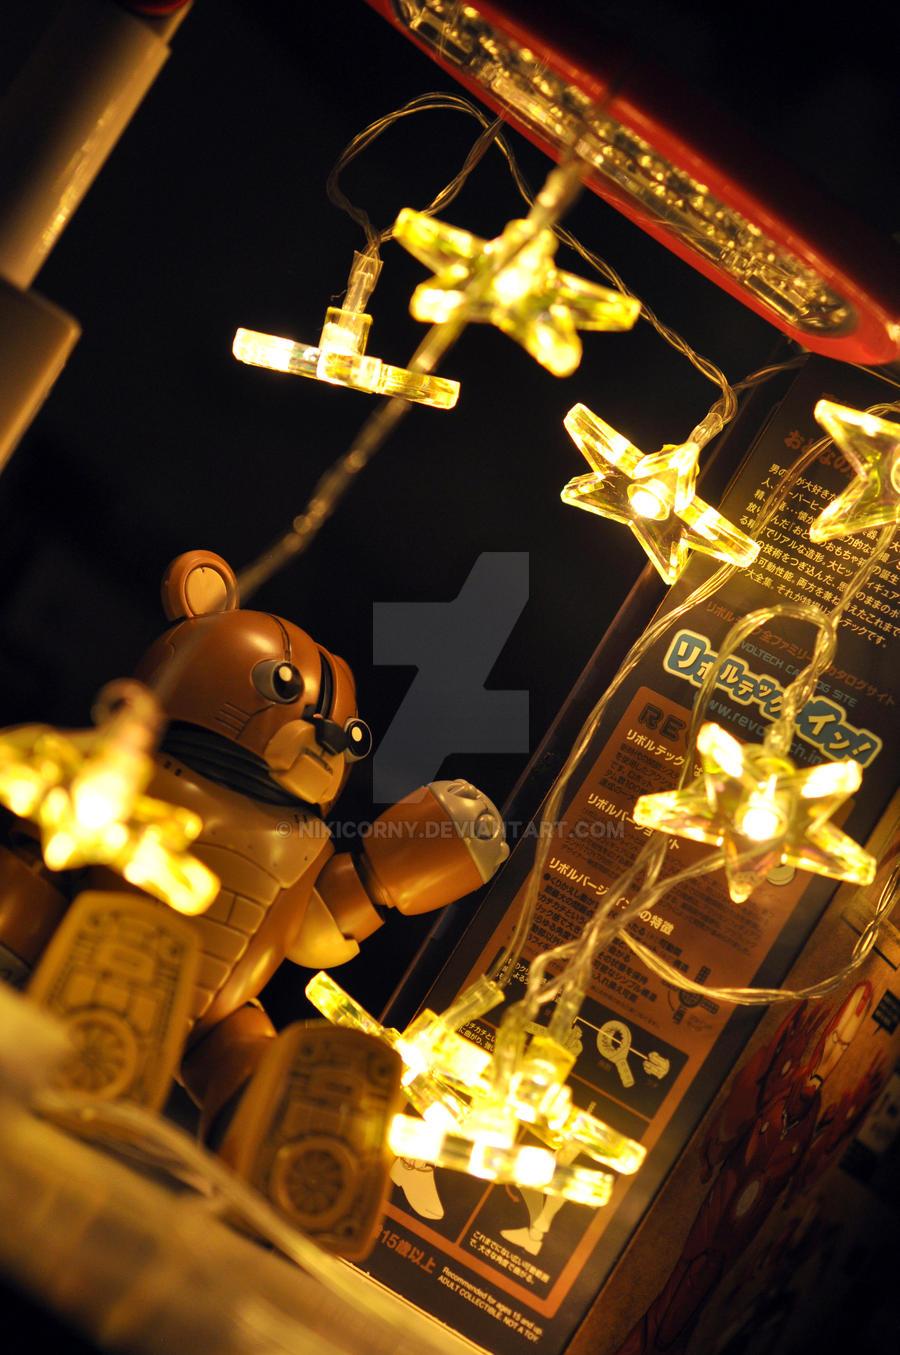 Star Playground by nikicorny